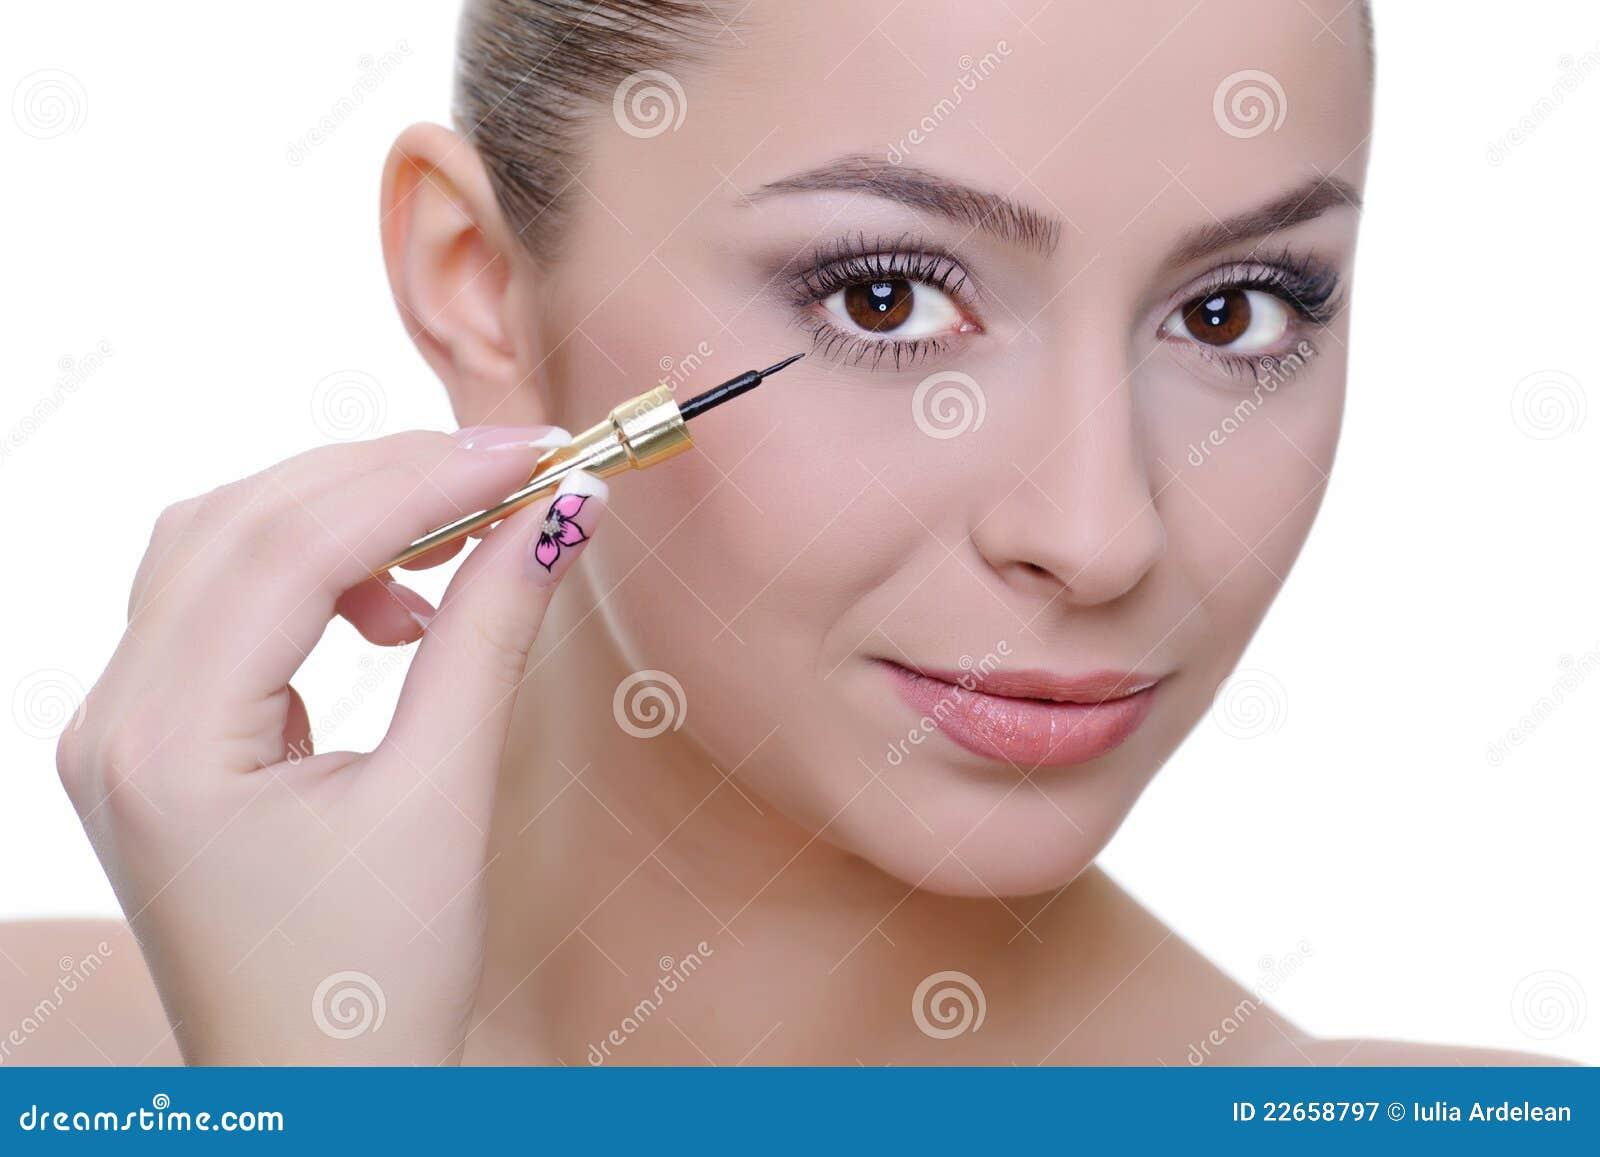 Applying eye-liner